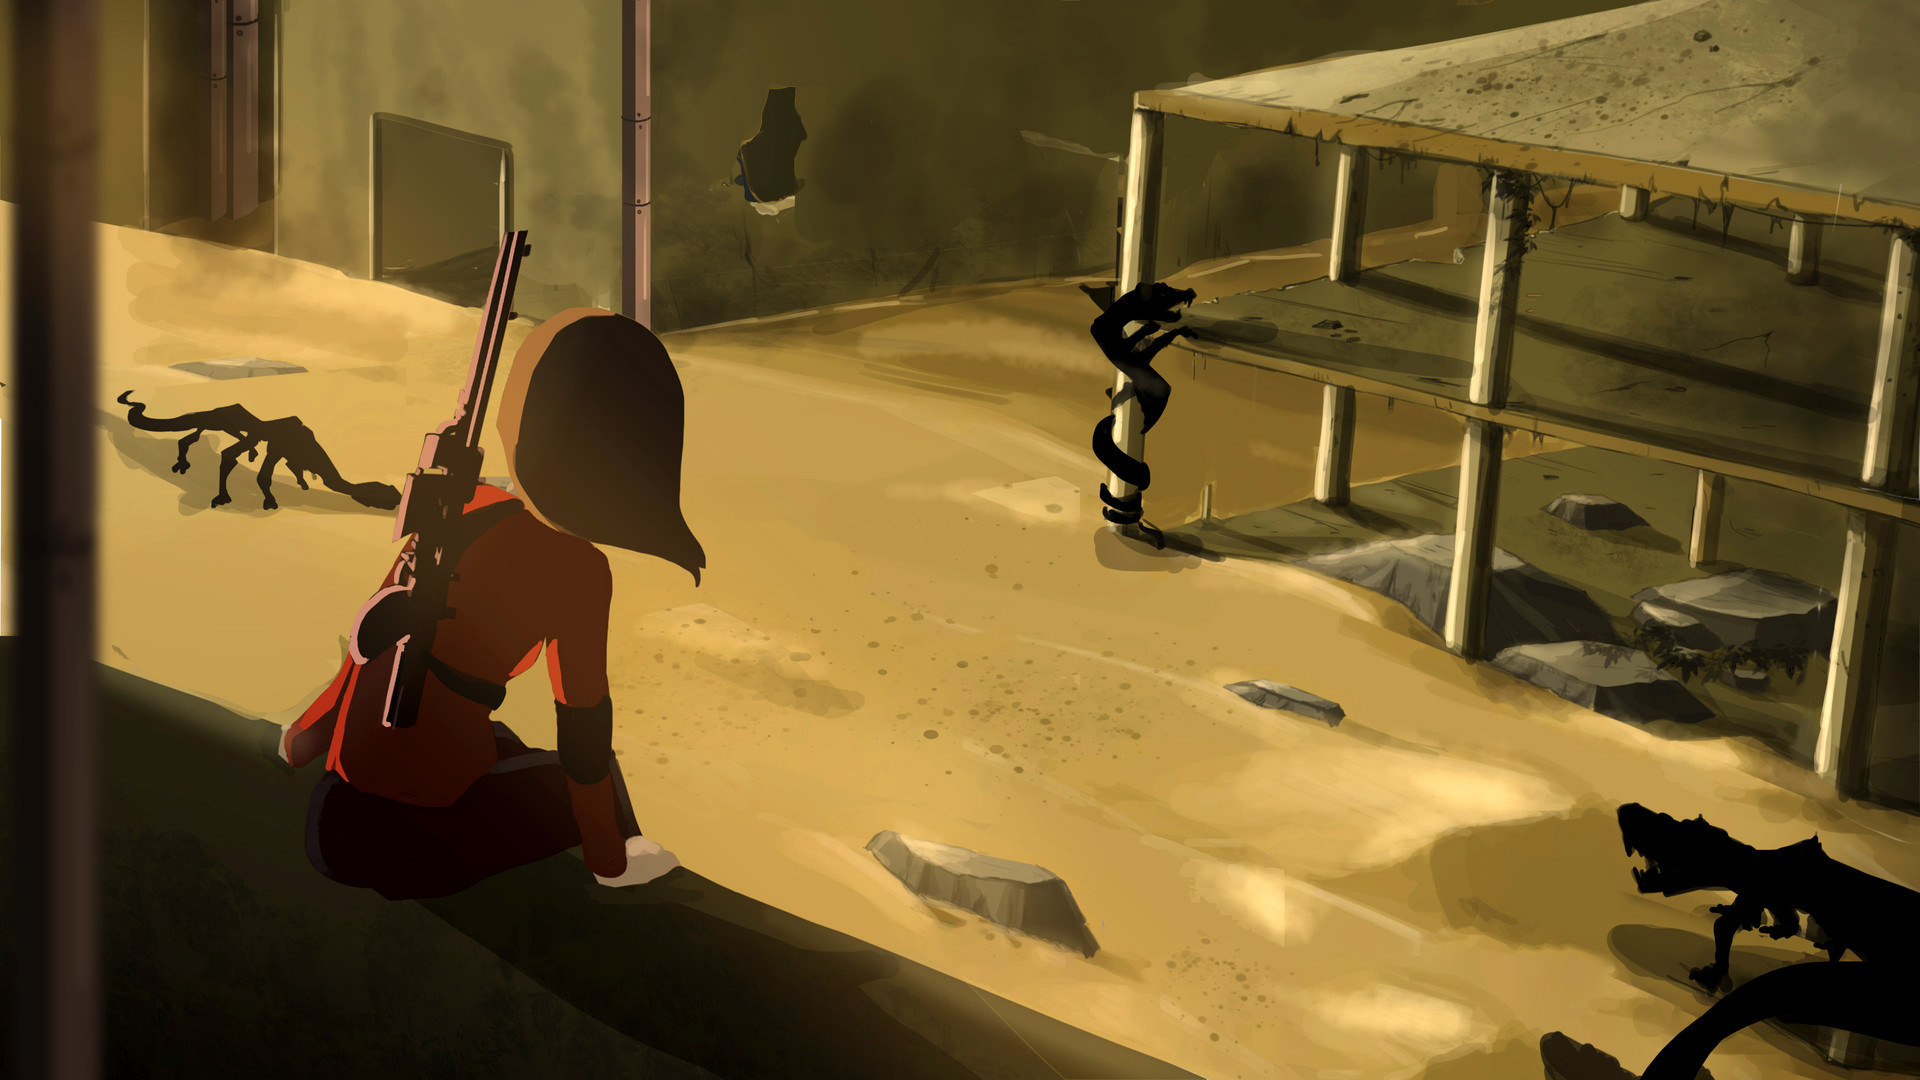 Sand Apocalypse-Illustration, 2019